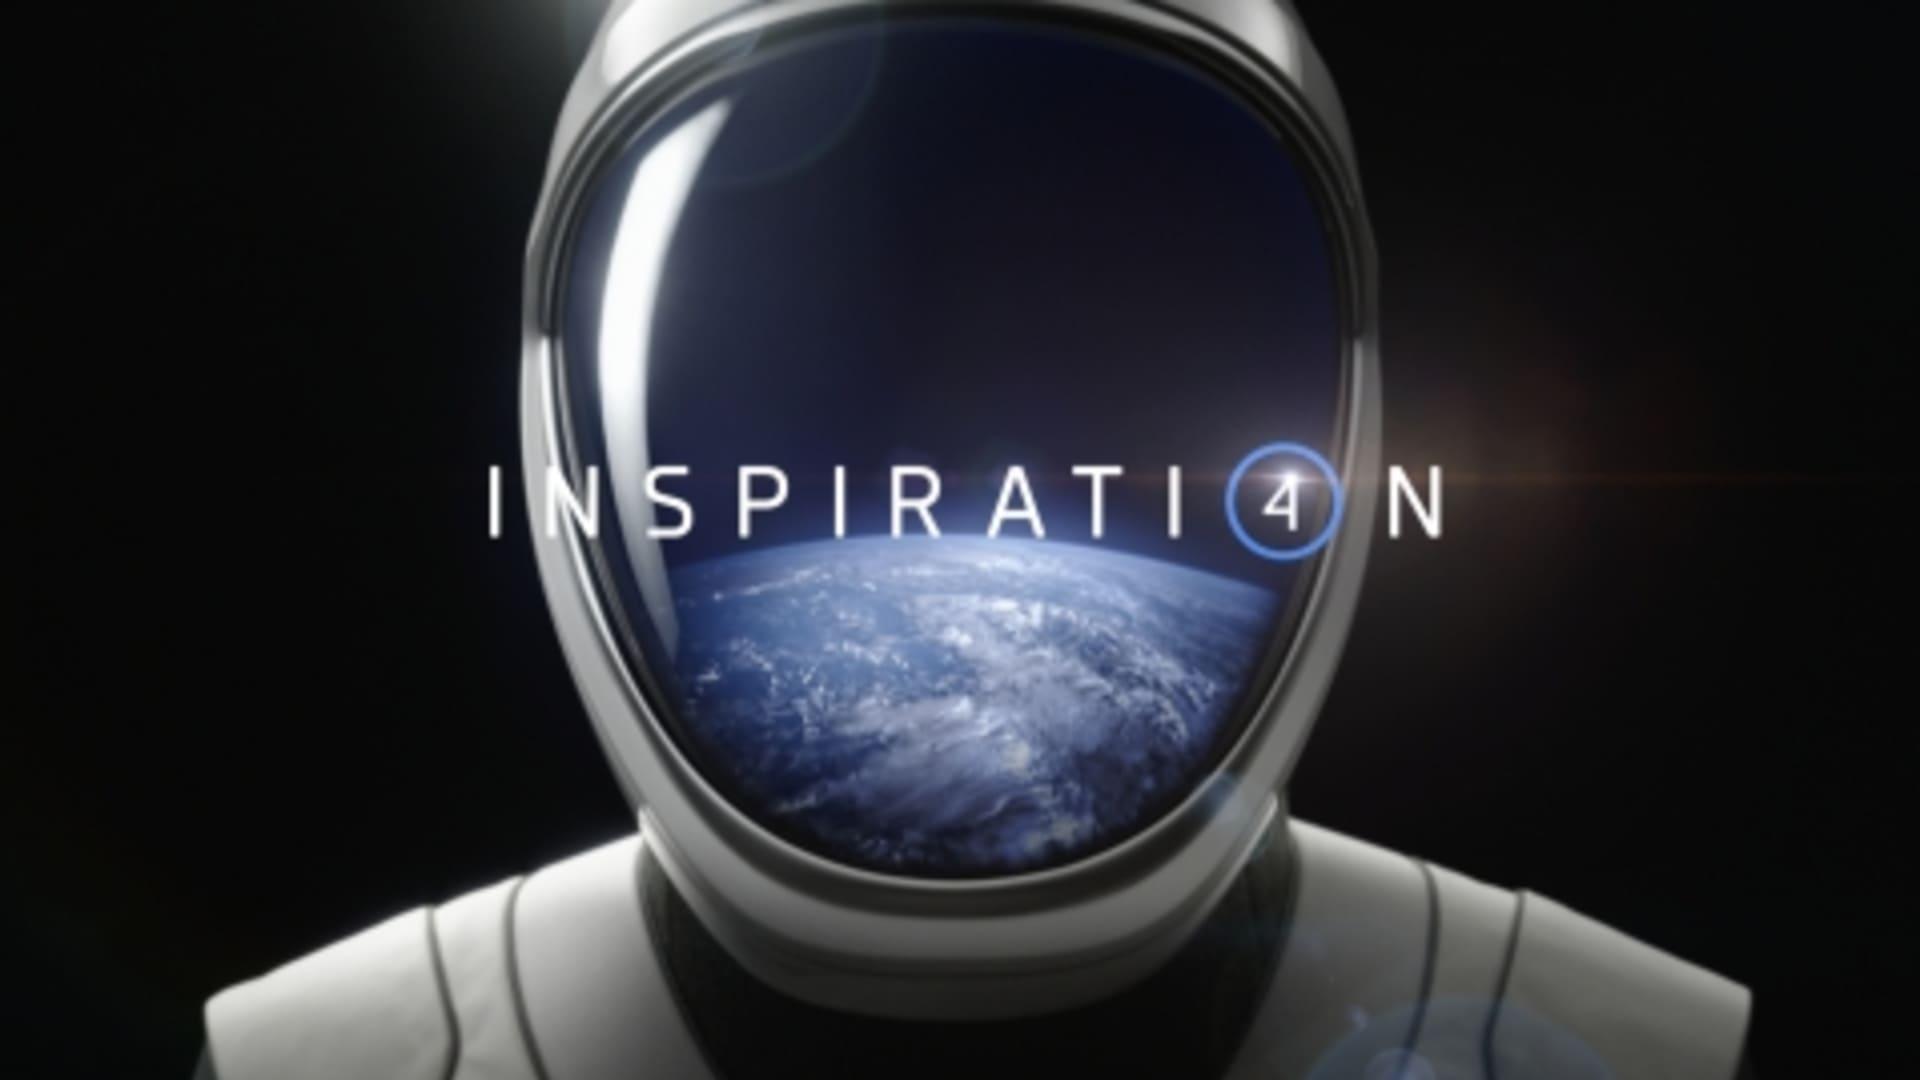 Inspiration4 Super Bowl ad.